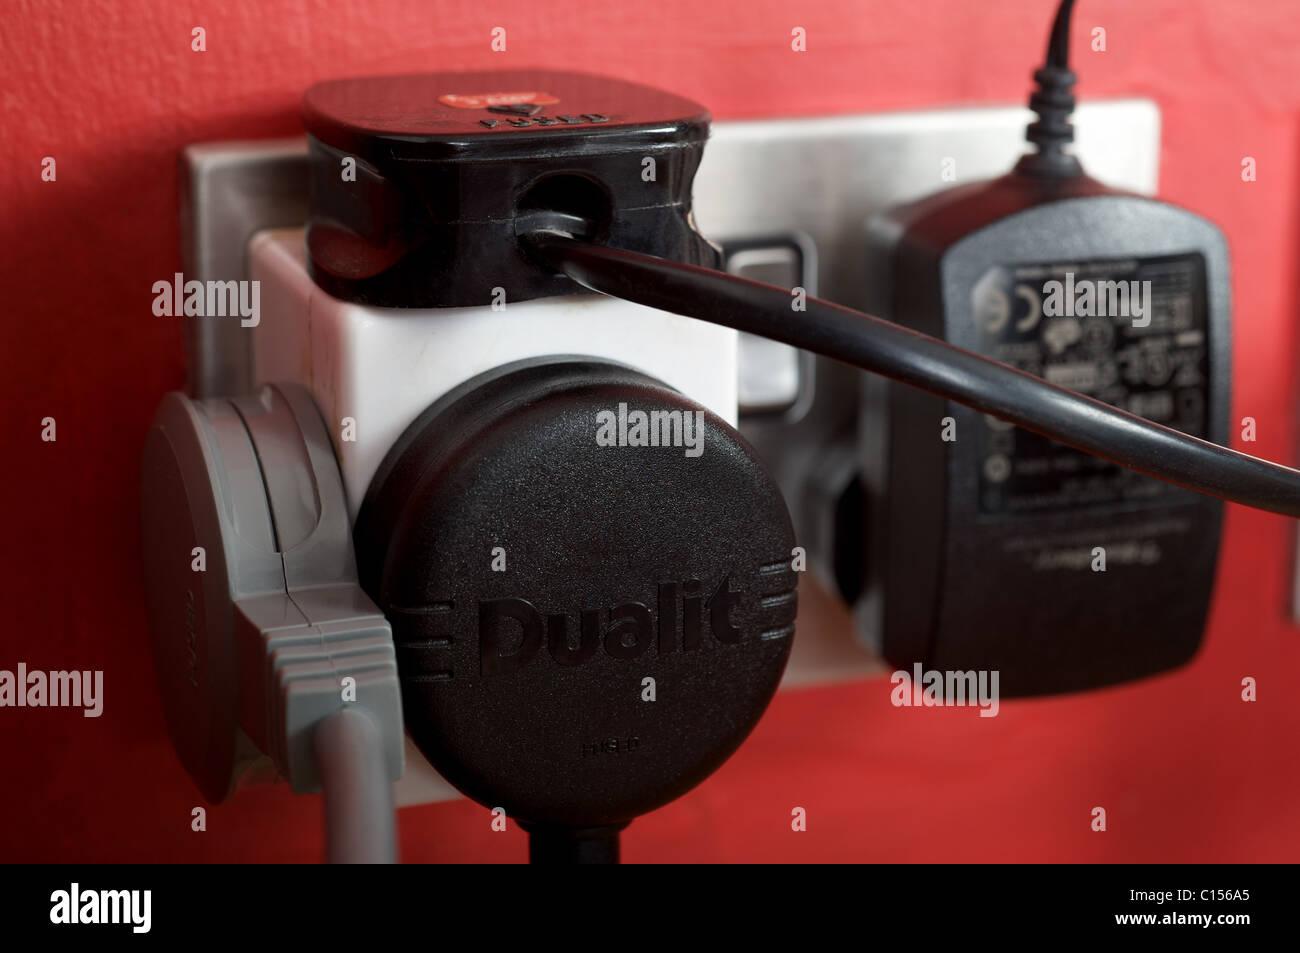 Overloaded electrical sockets (UK) Stock Photo